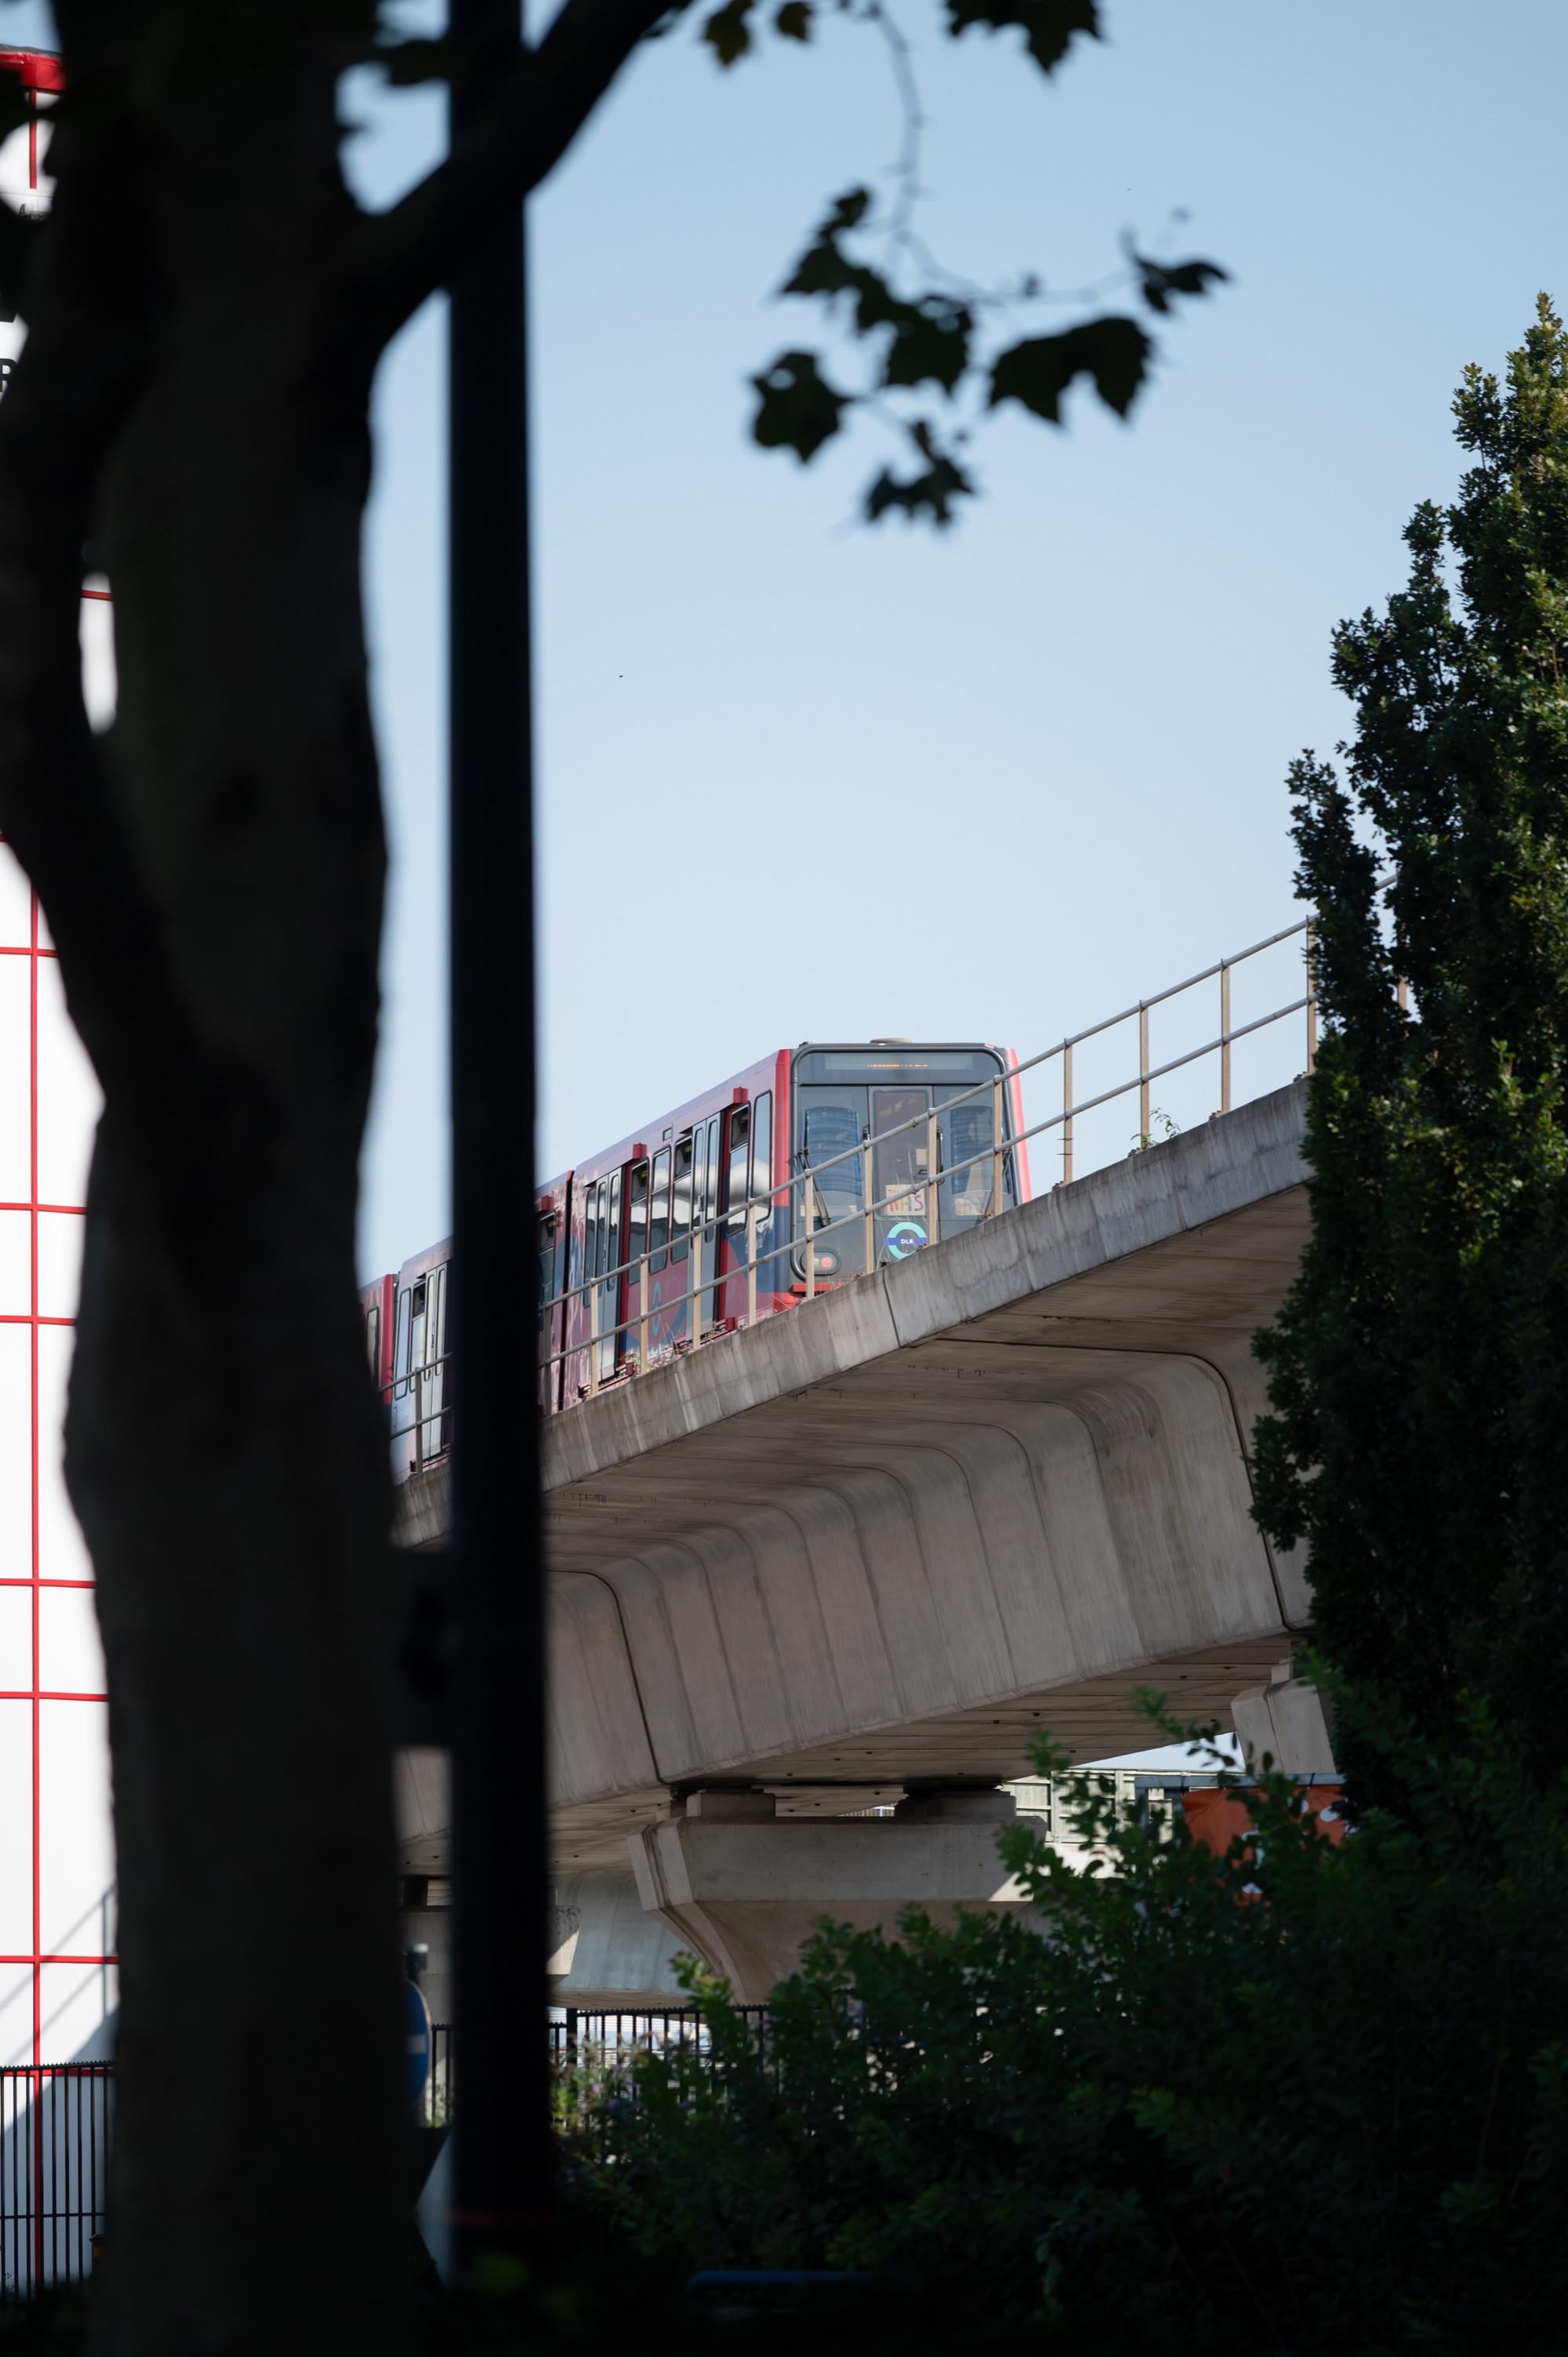 DLR train in the Royal Docks